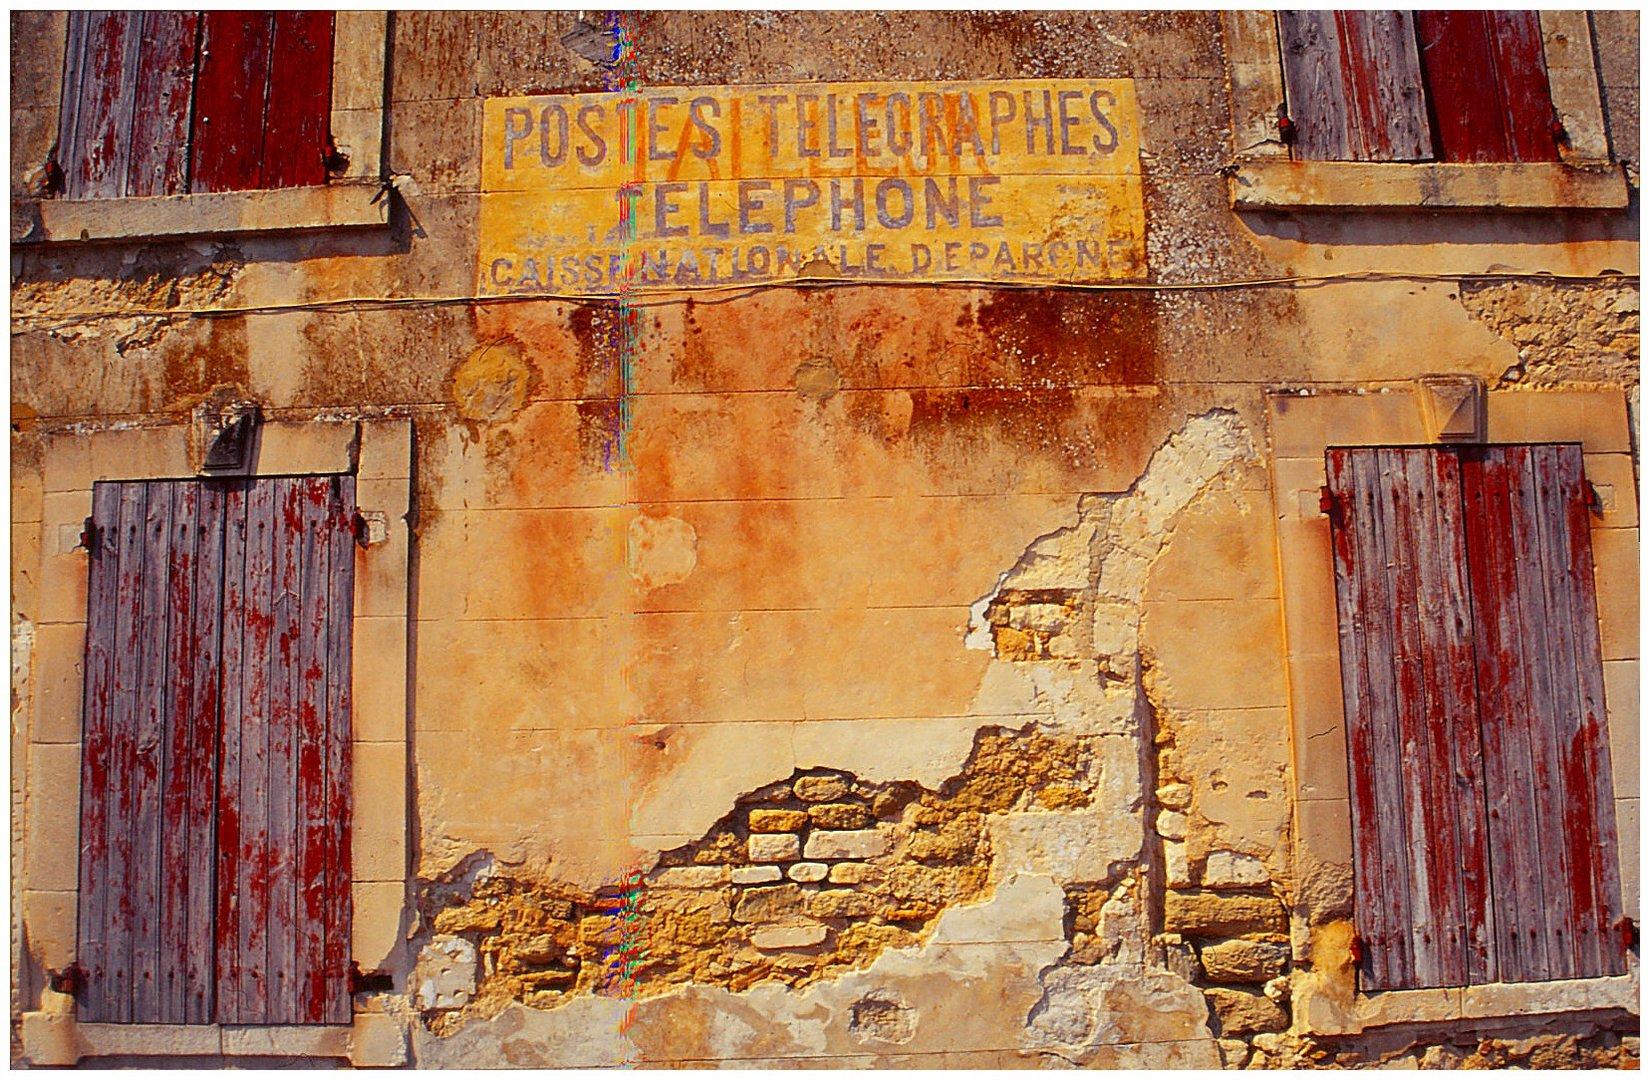 Postes telegraphes telephone